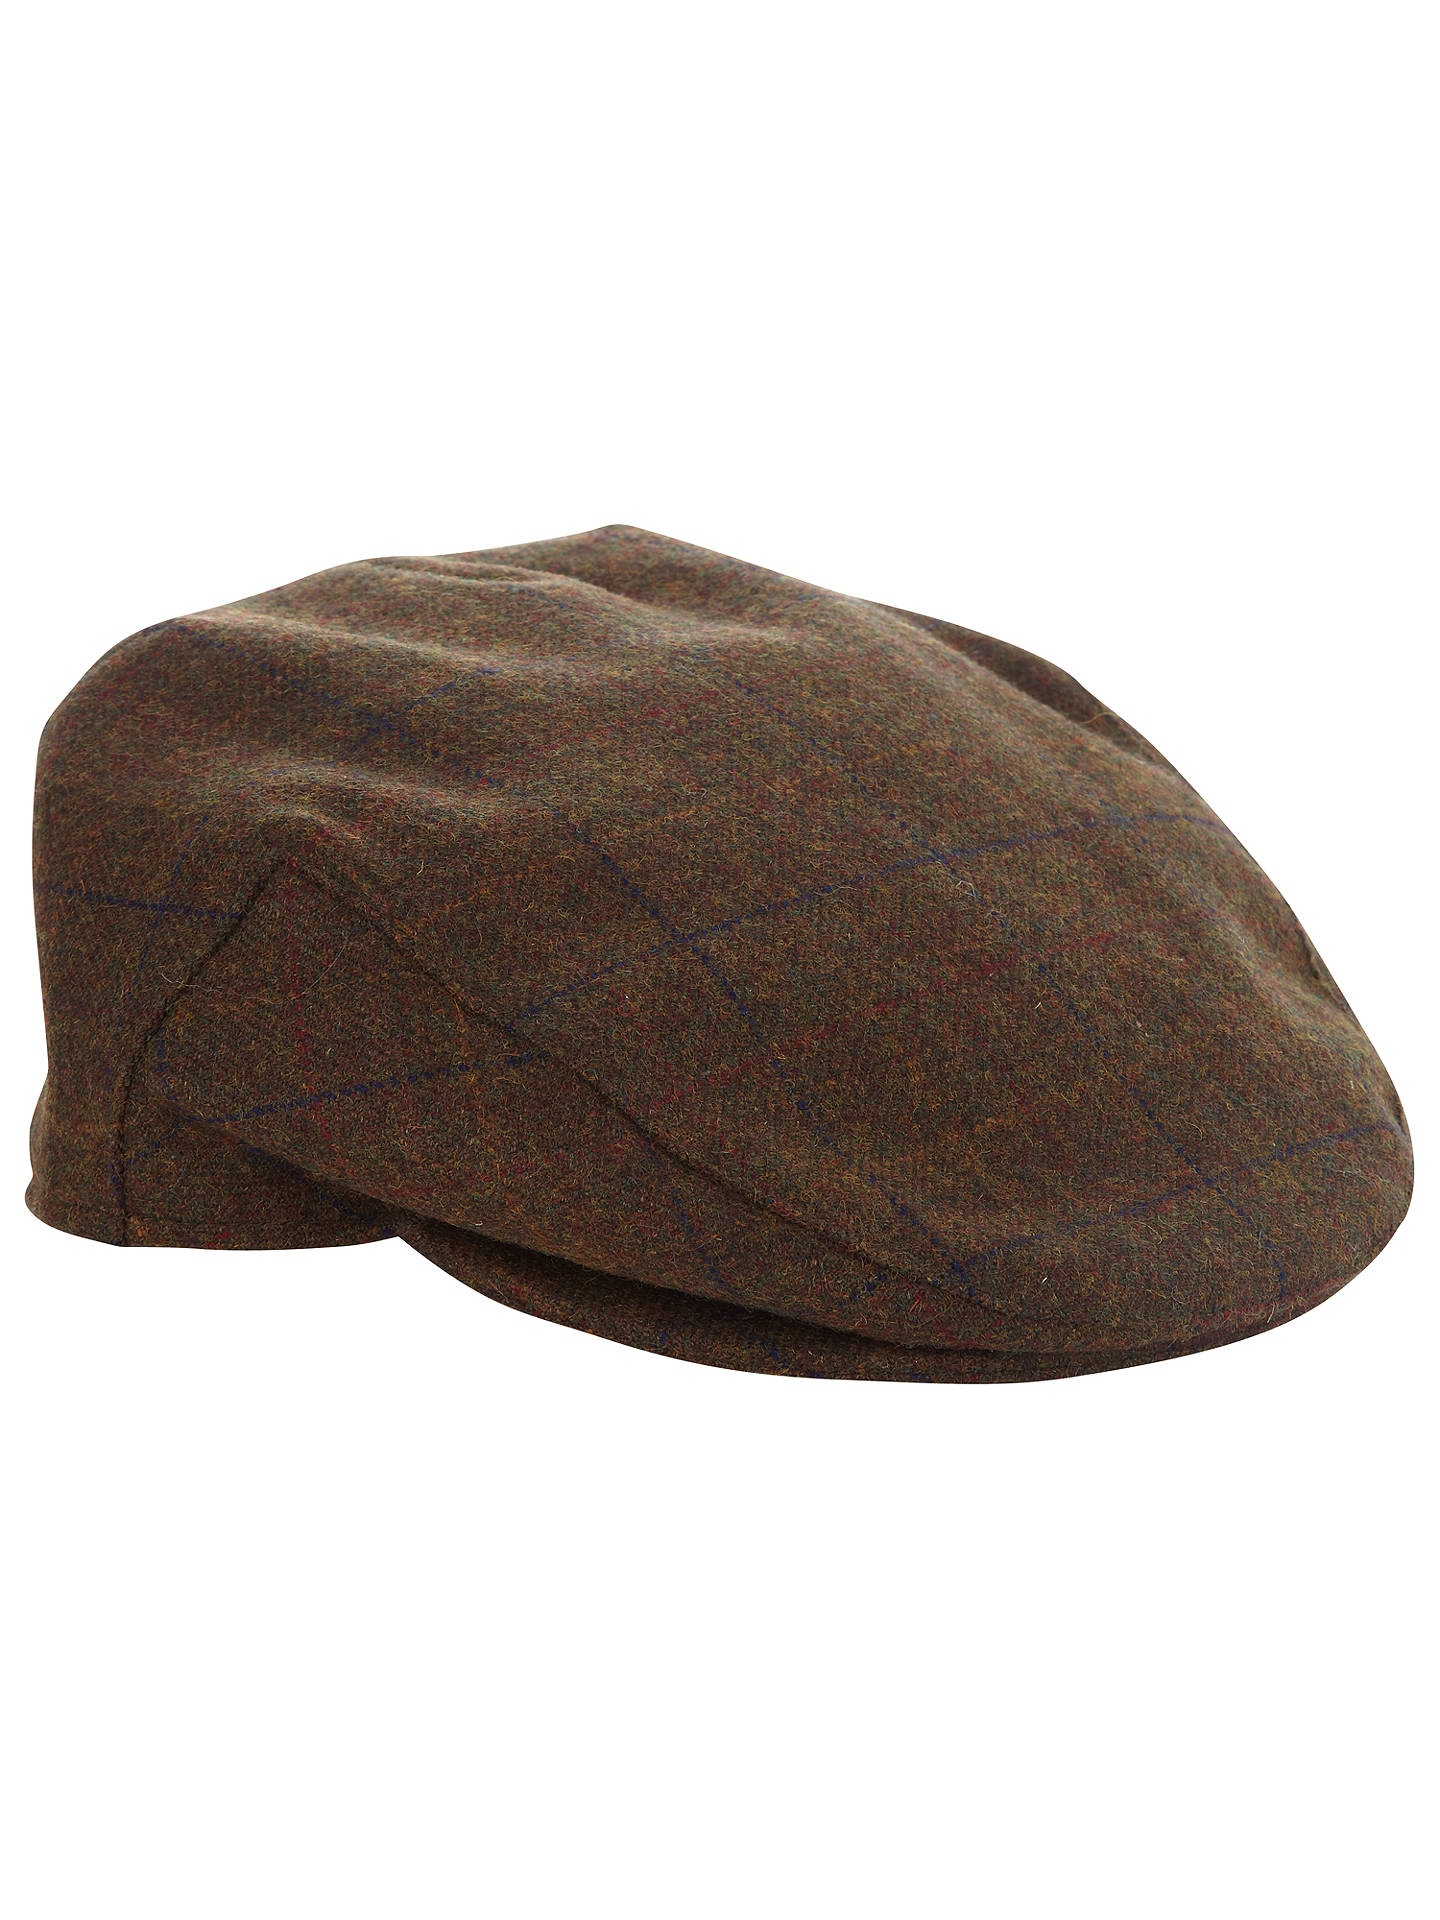 a2da83022 John Lewis Tweed Flat Cap, Brown at John Lewis & Partners